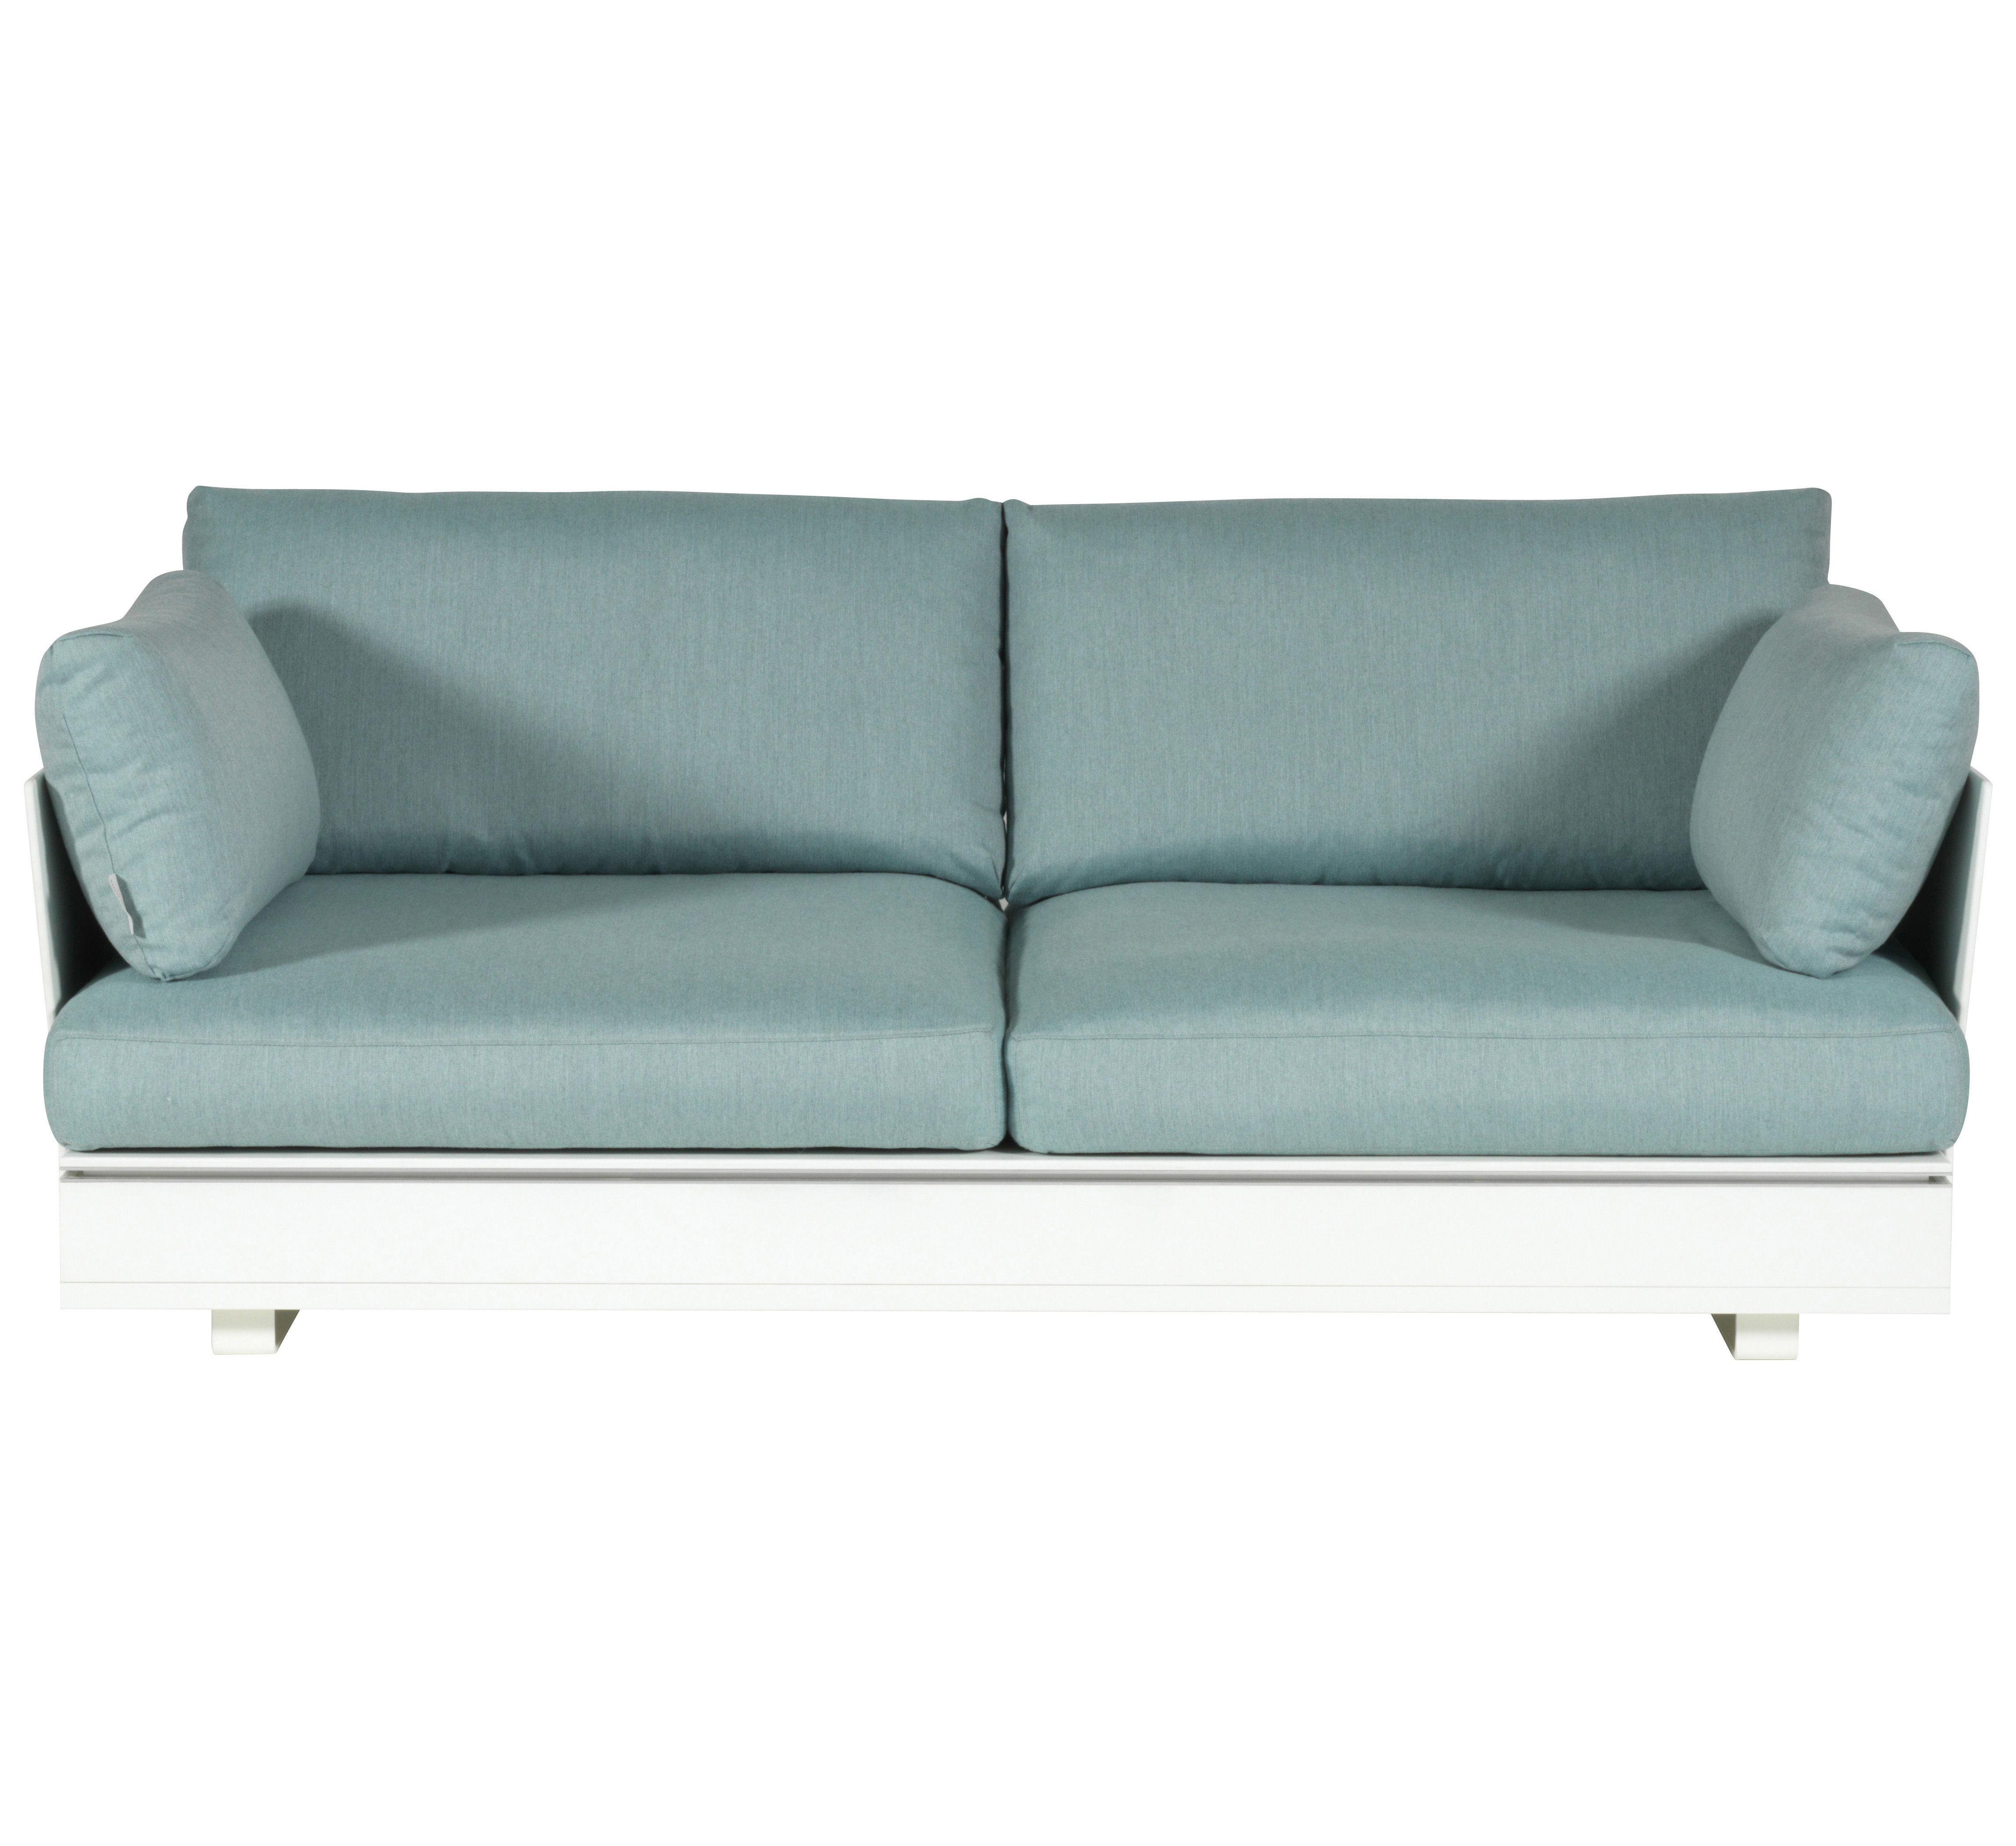 canap droit pure 2 places l 180 cm blanc coussins gris vert viteo made in design. Black Bedroom Furniture Sets. Home Design Ideas